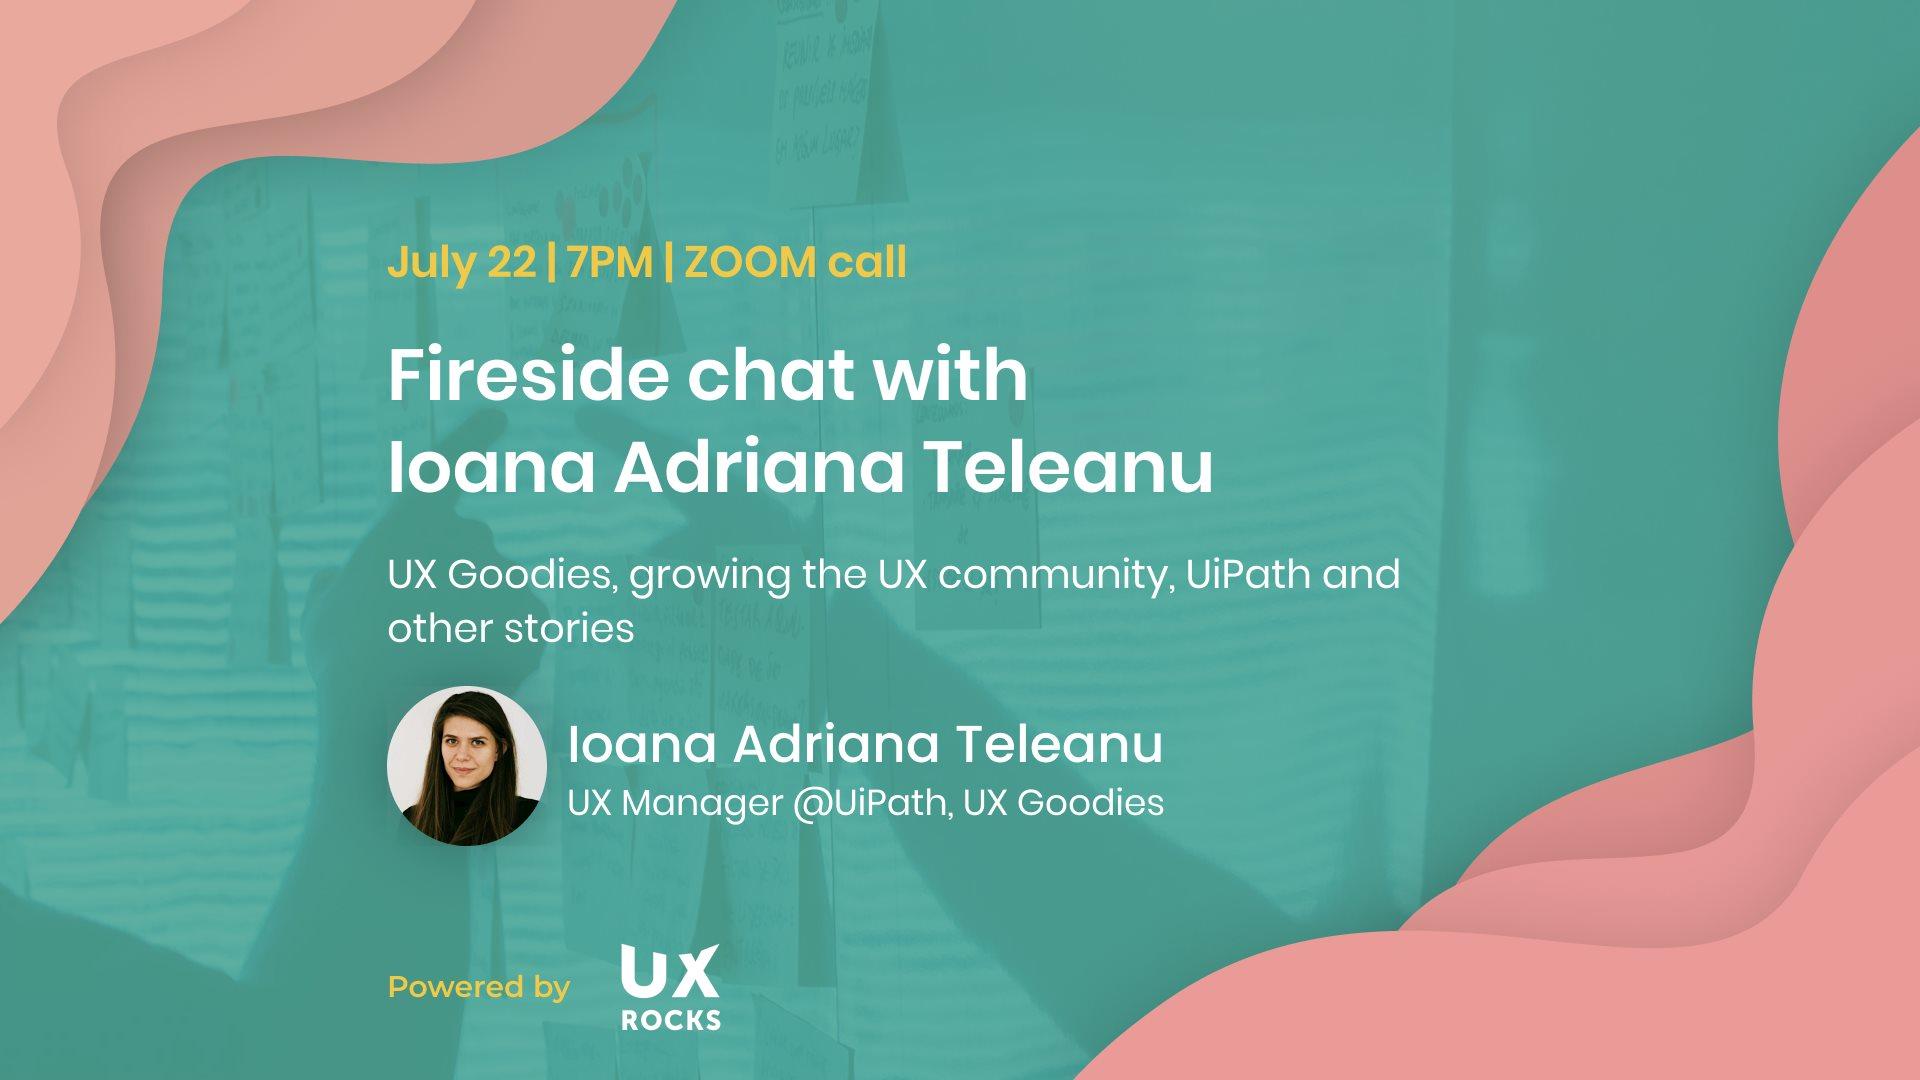 UX Meetup #8: Firesidechat with Ioana Adriana Teleanu